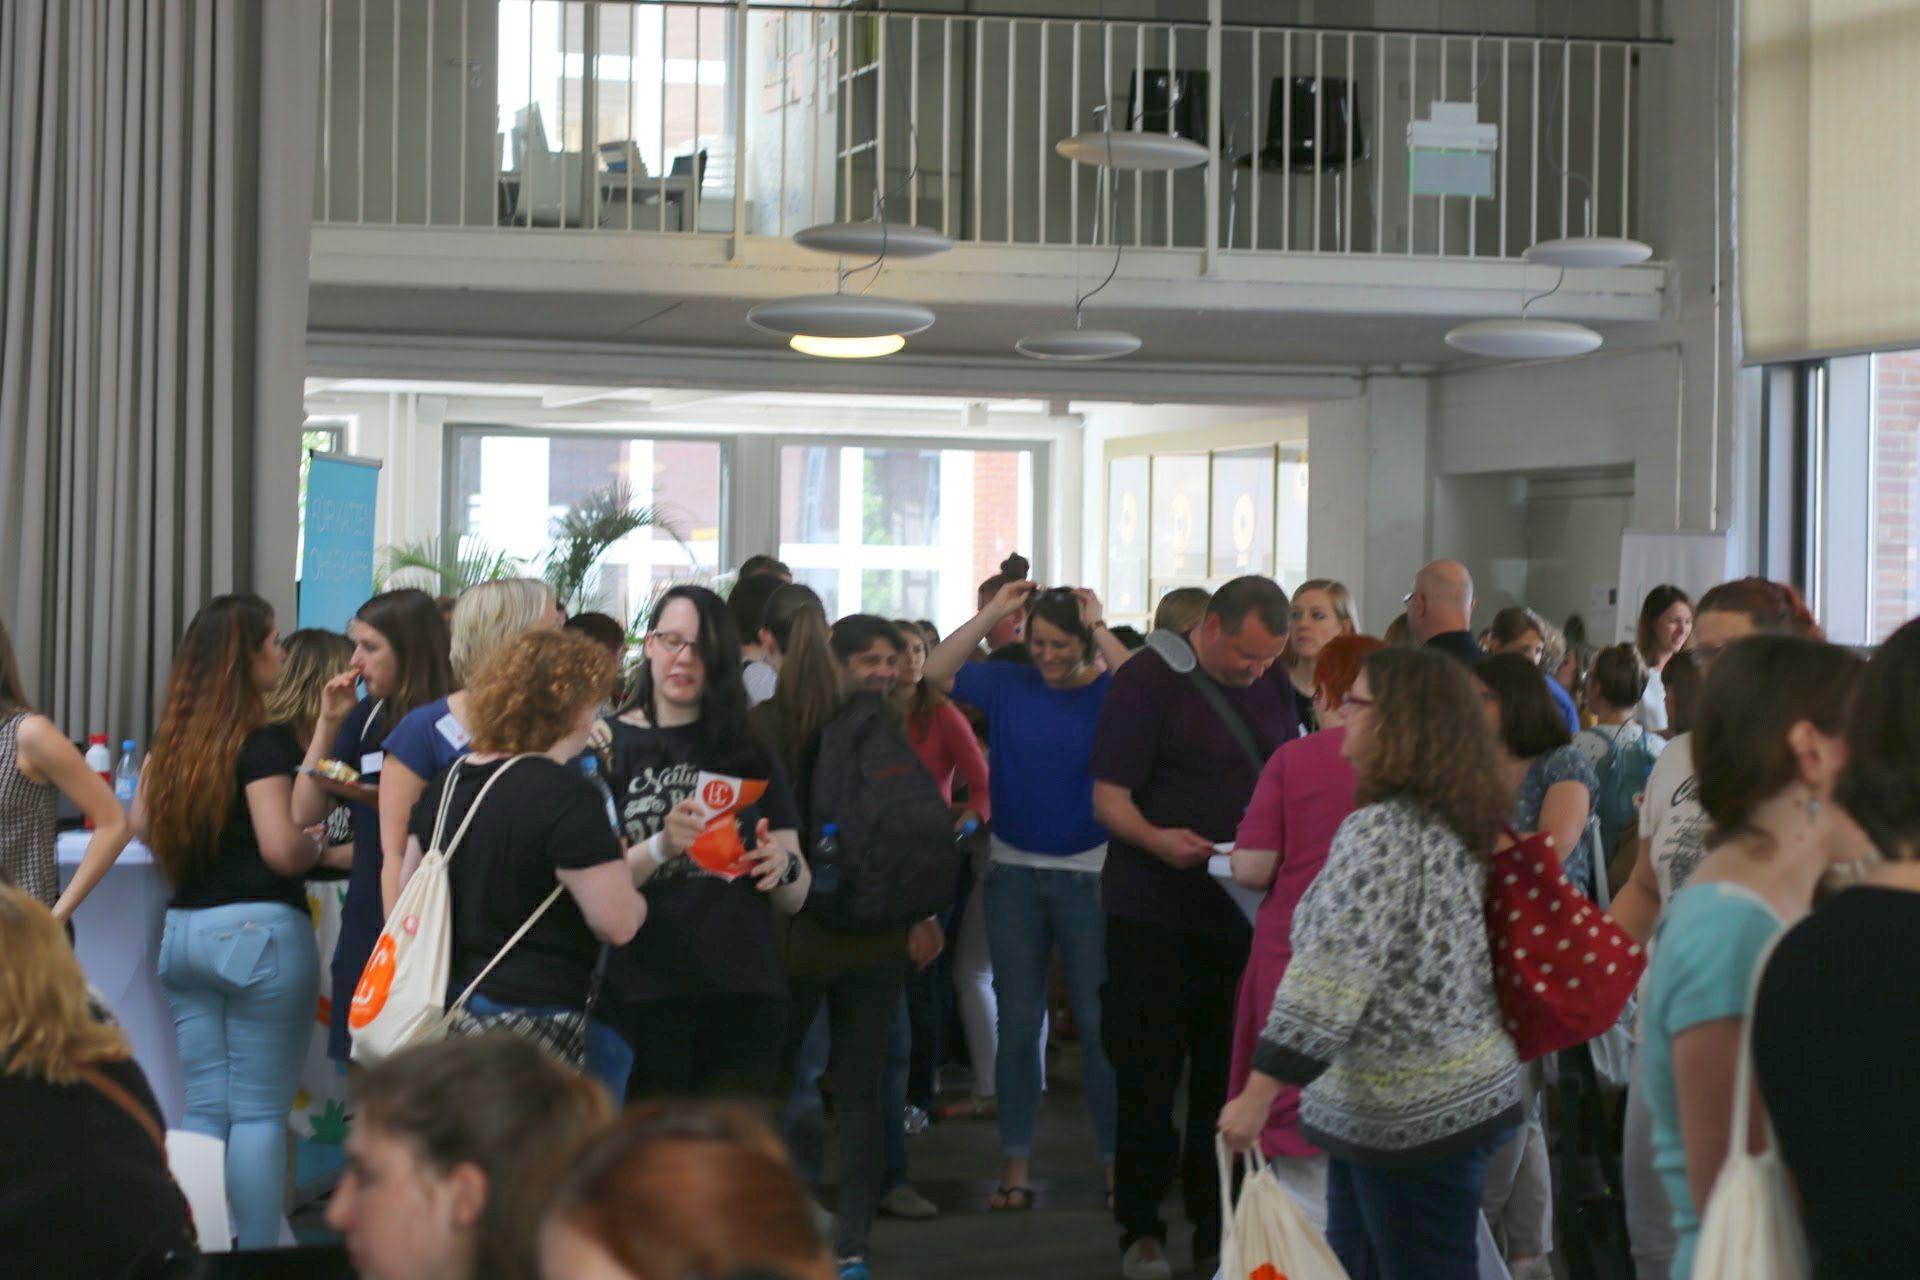 LitBlog Convention 2017